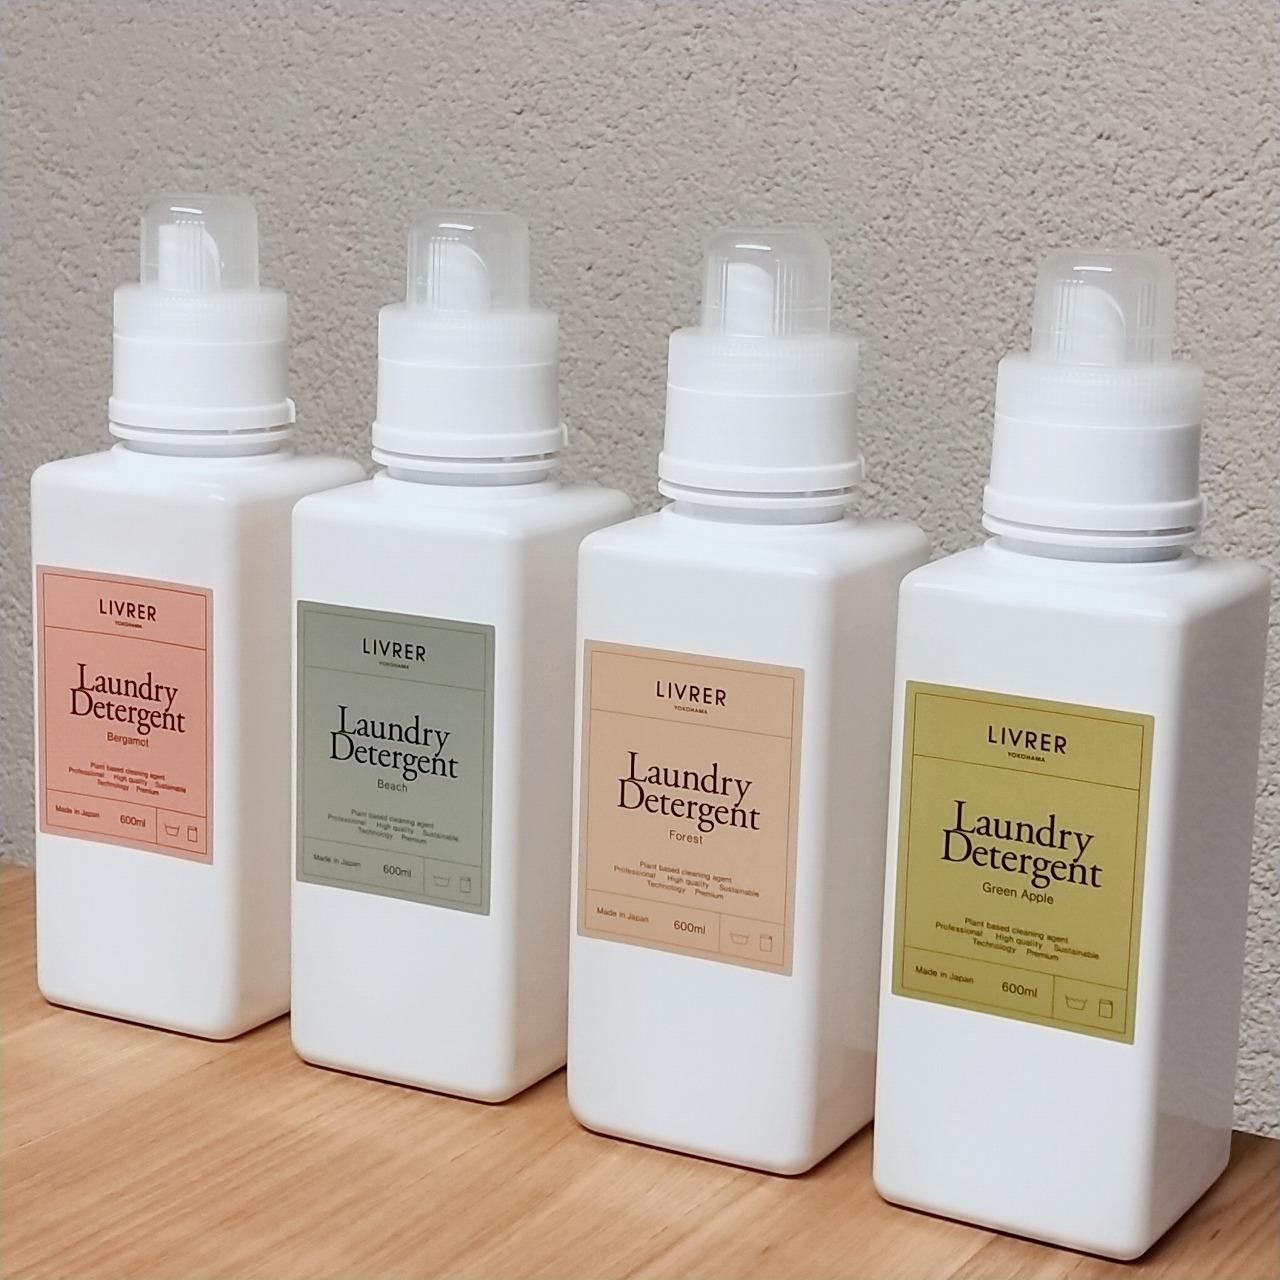 LIVRER yokohama Landry Detergent 洗濯用洗剤